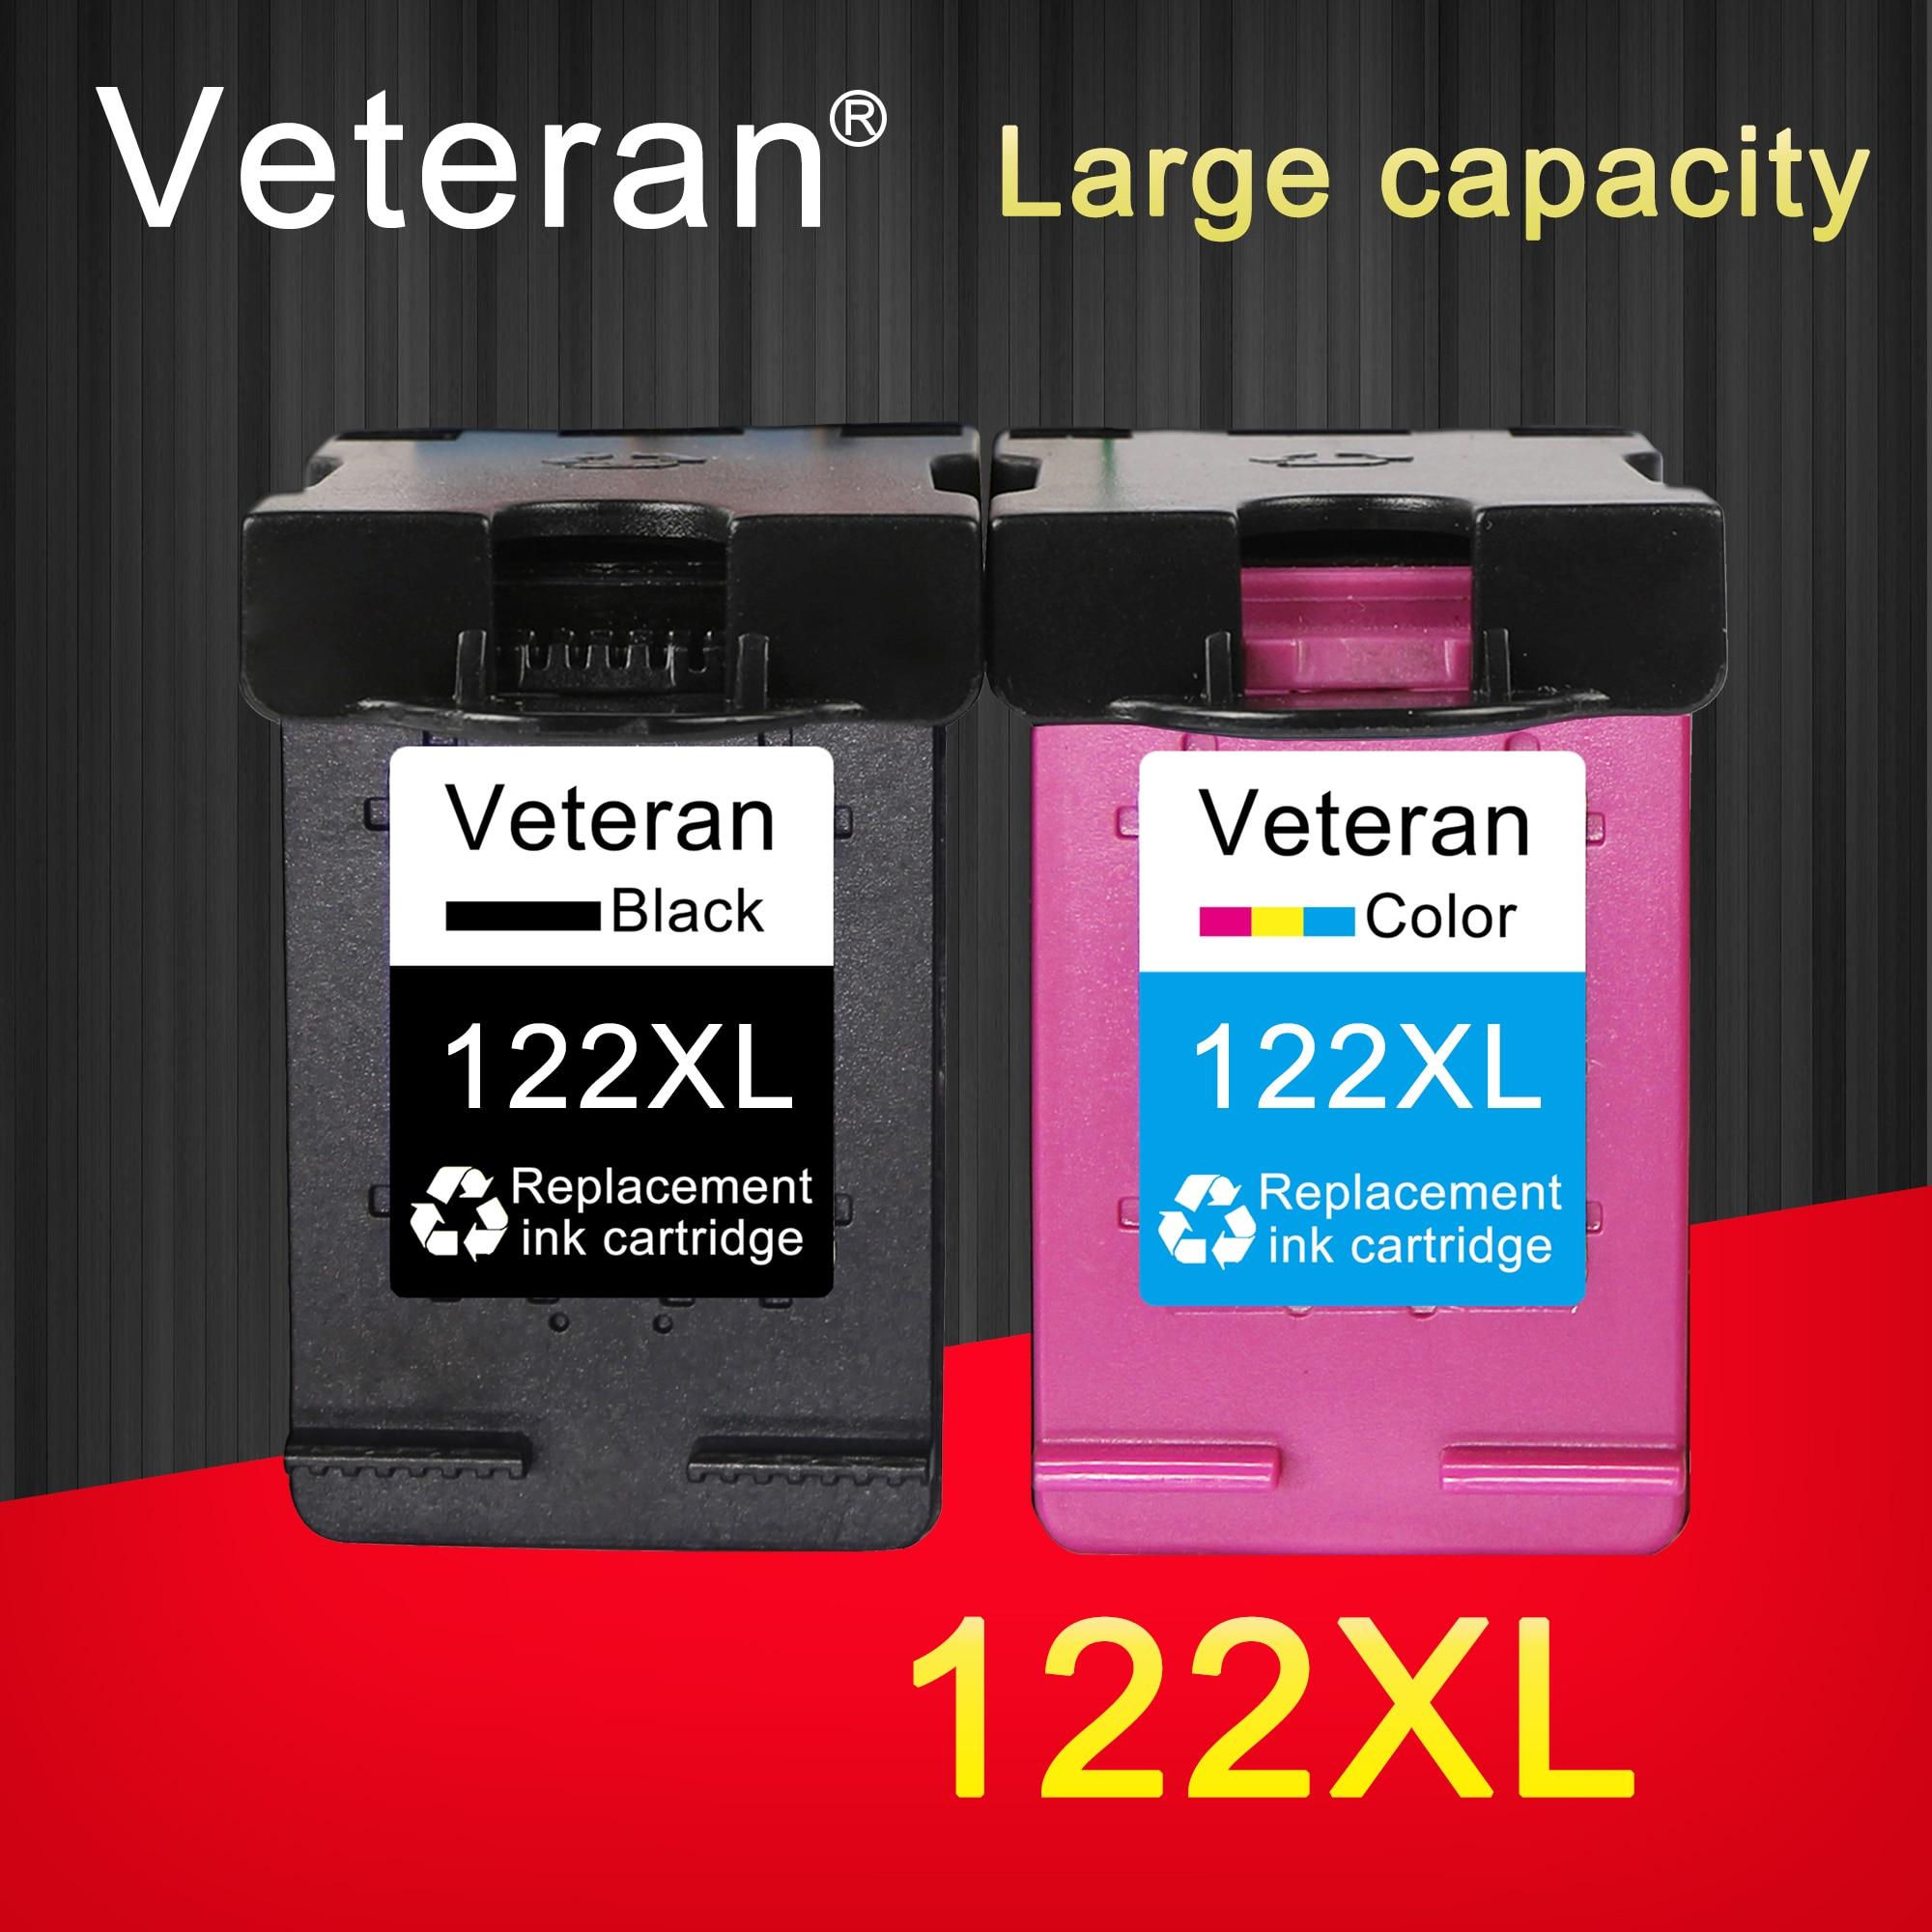 Veteran 122XL Replacement for hp cartridge 122 xl for Deskjet 1510 2050 1000 1050 1050A 2000 2050A 2540 3000 3050 3052A printer